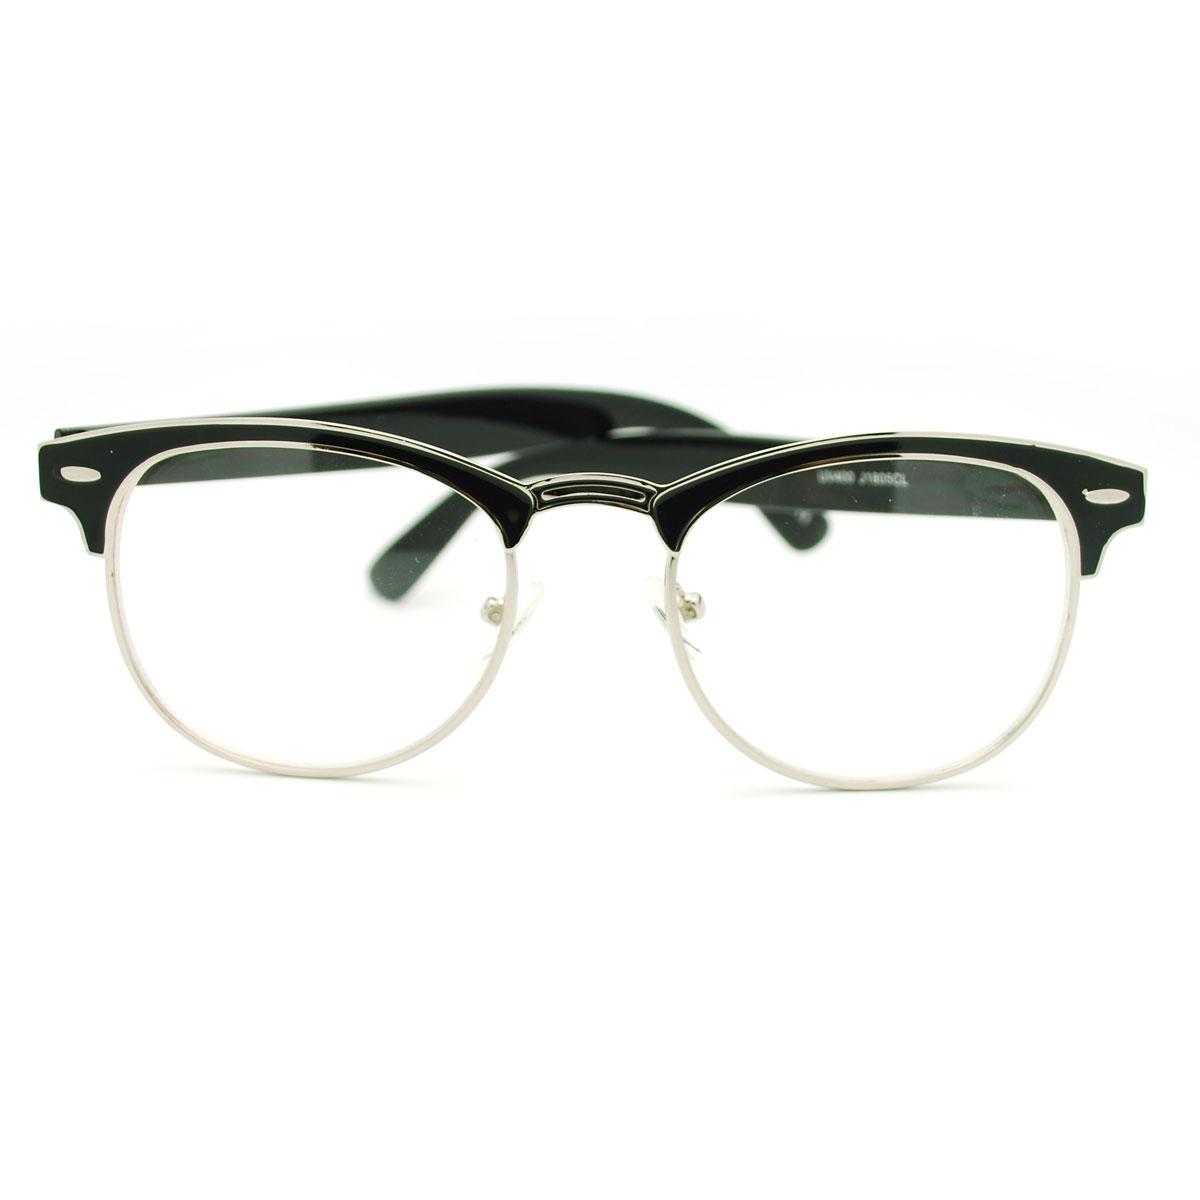 Eyeglass Frame Half Rim : Colorful Metal Half Rim Eye Glasses Frame Celebrity Style ...